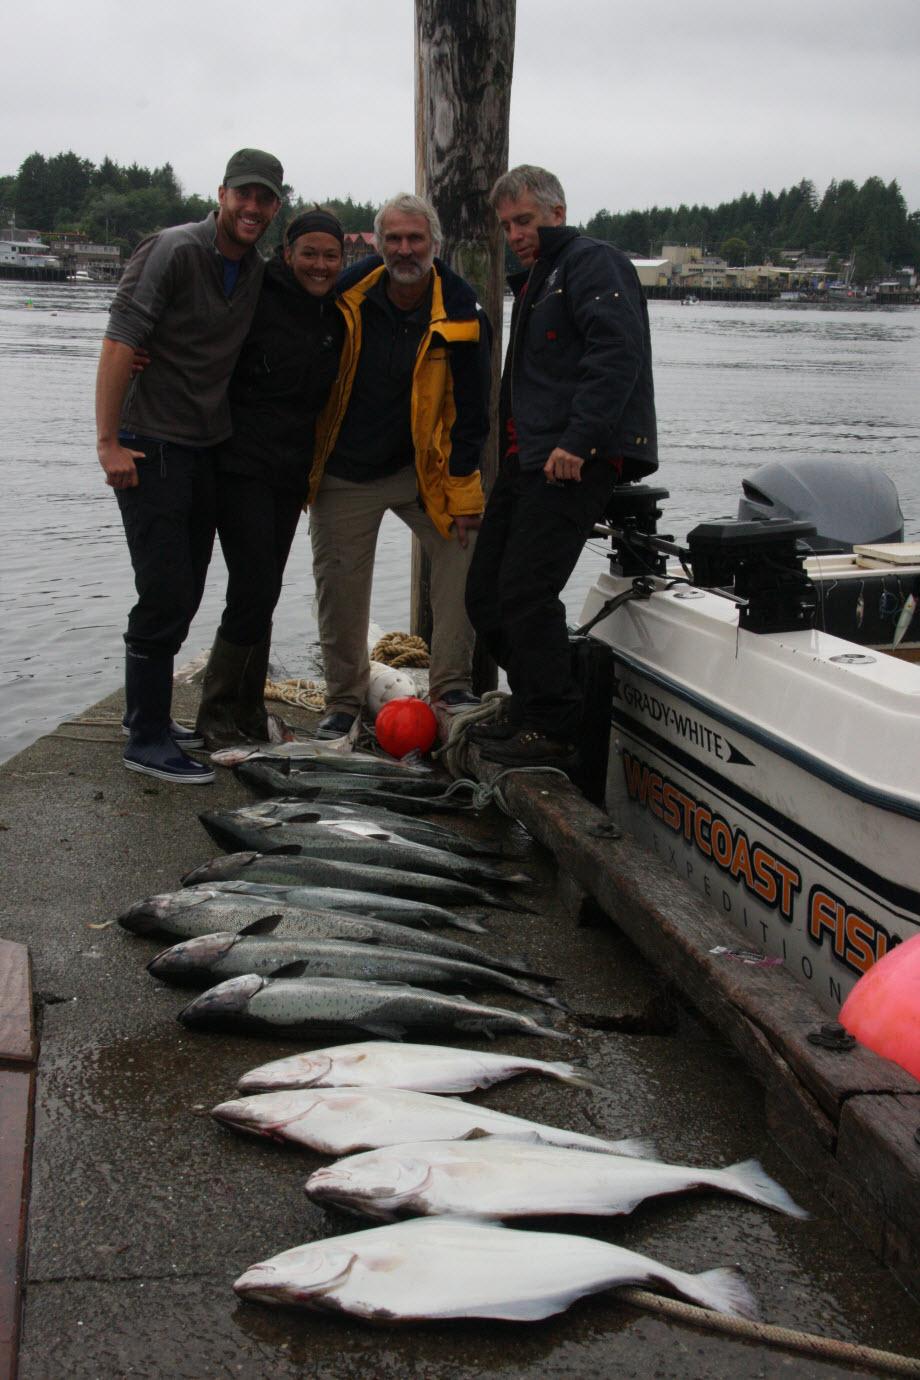 WestCoastFish4119